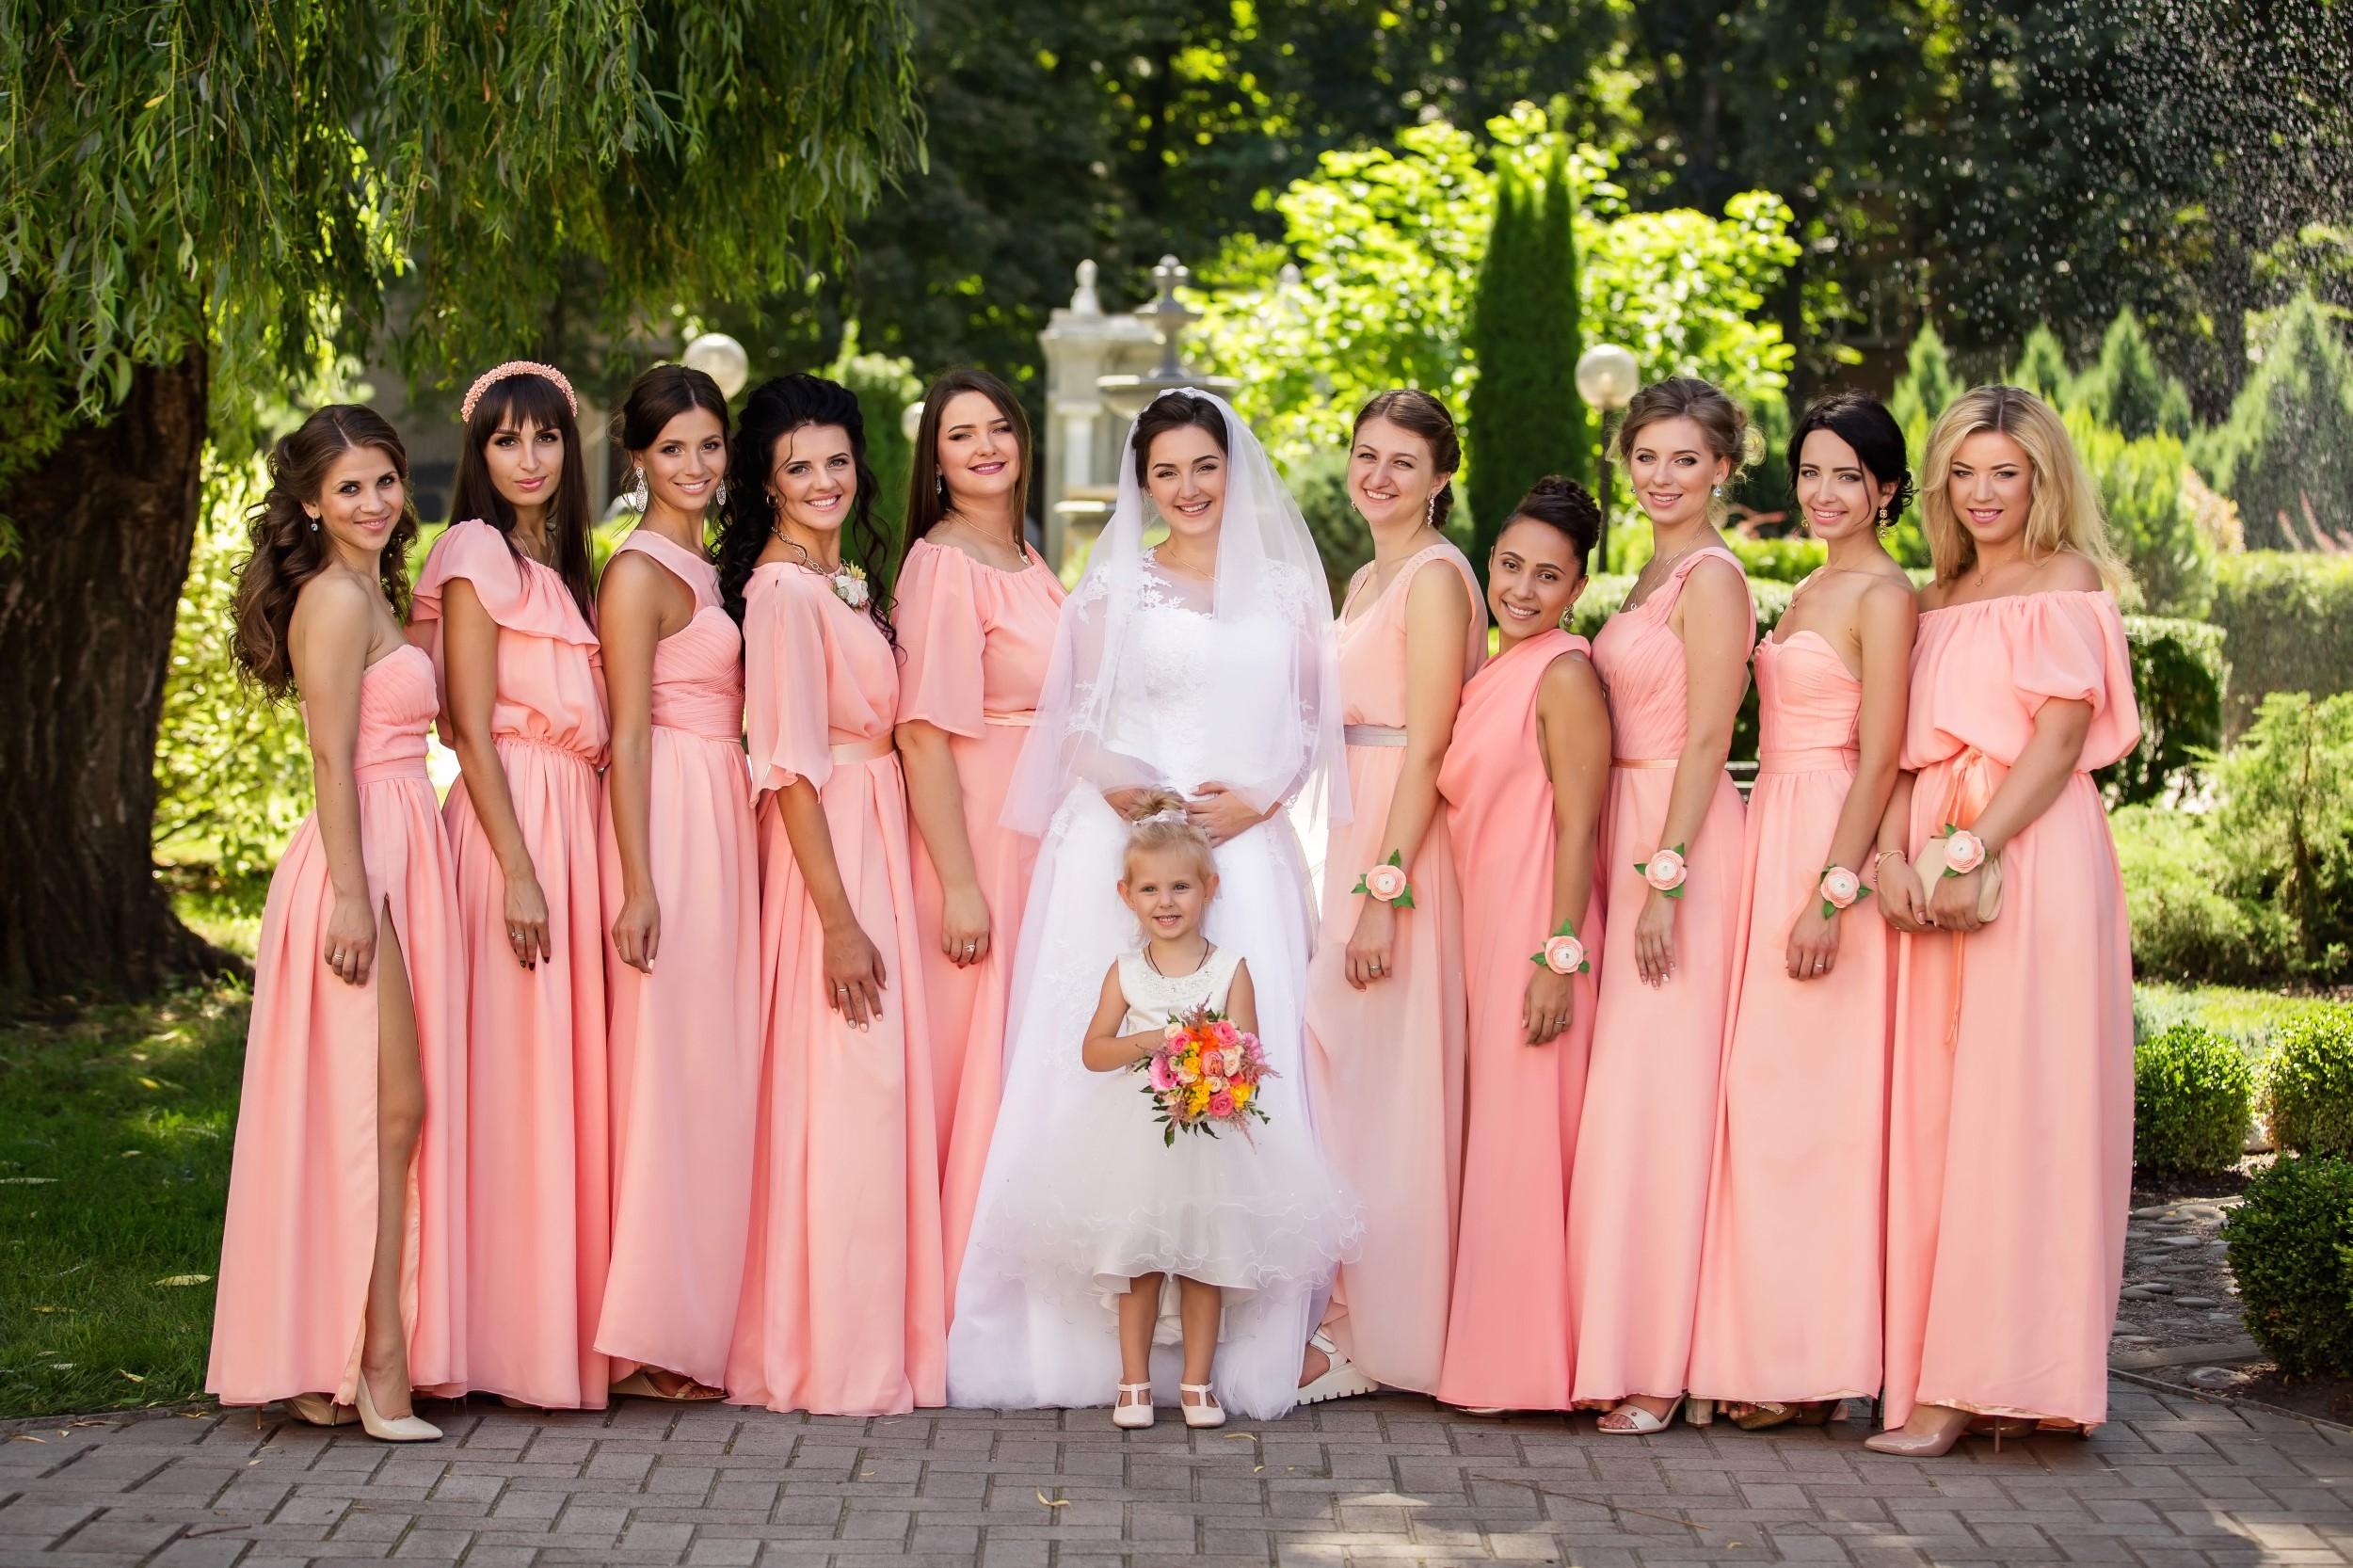 CANON WEDDING BRIDESMAIDS WITH BRIDE PHOTO AWARDS 003462 (Custom)